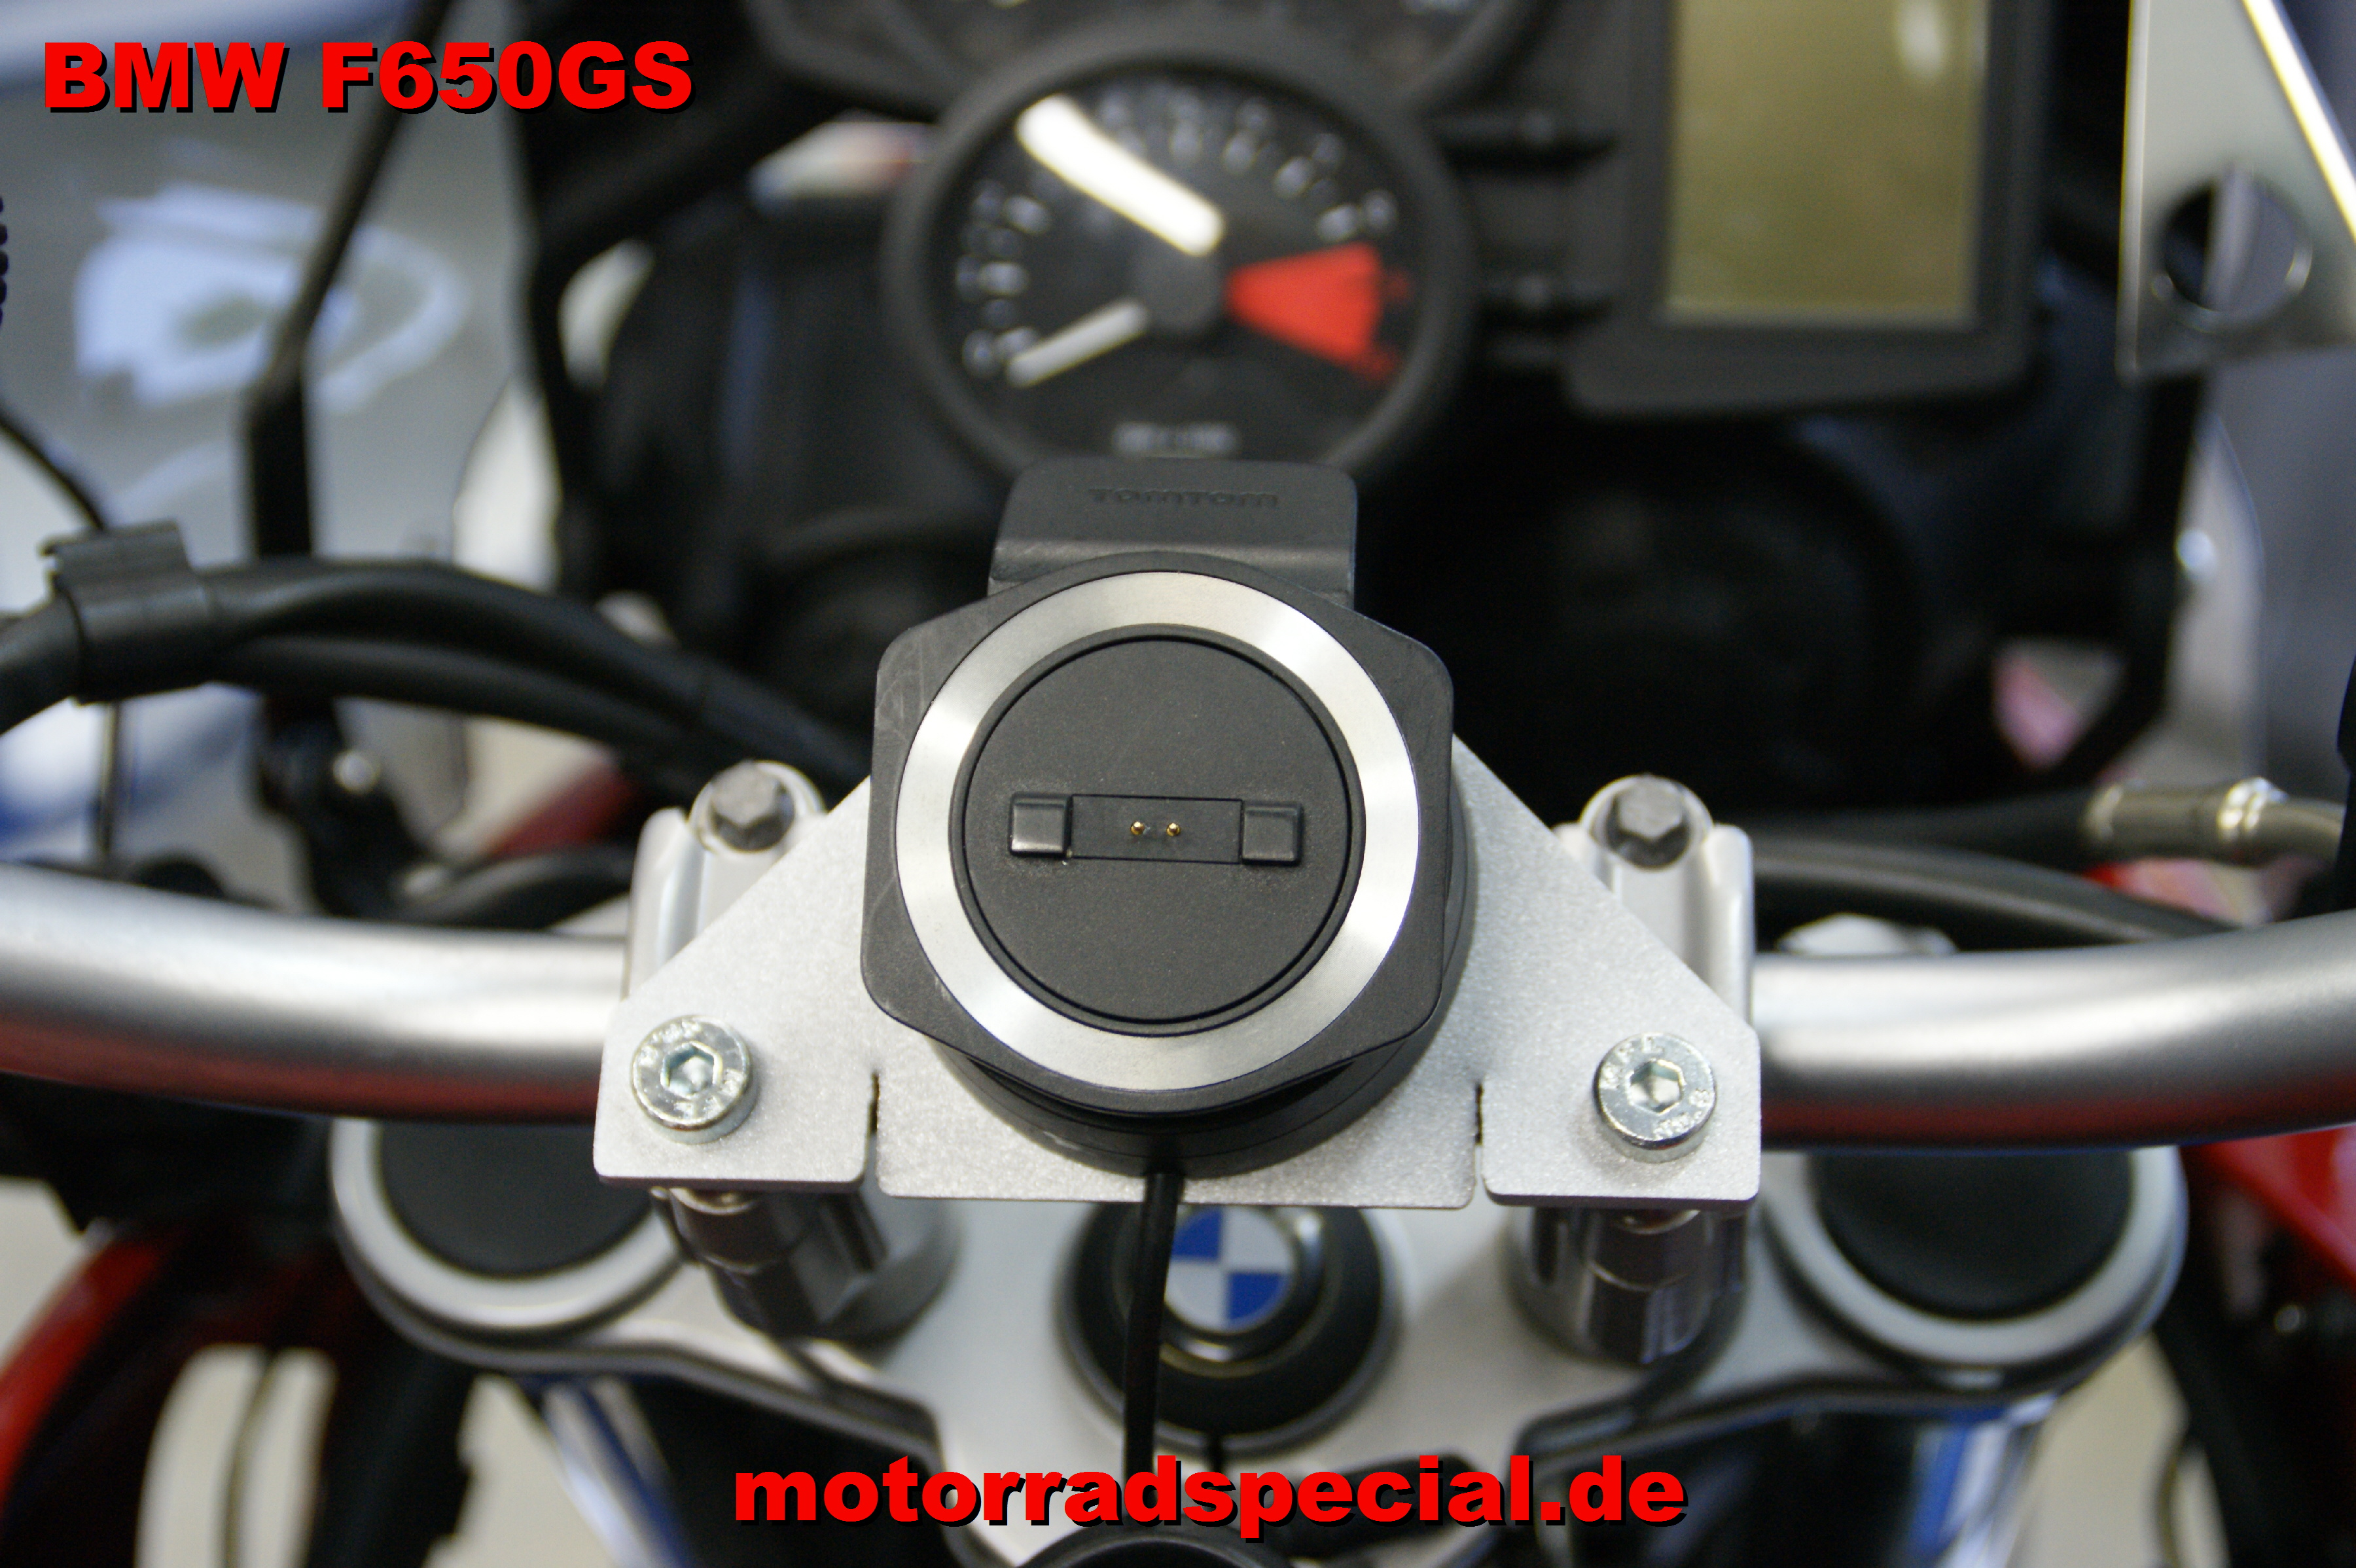 BMW_F650GS_Navigationshalterung_Navihalter_TomTom Rider_400_410_1